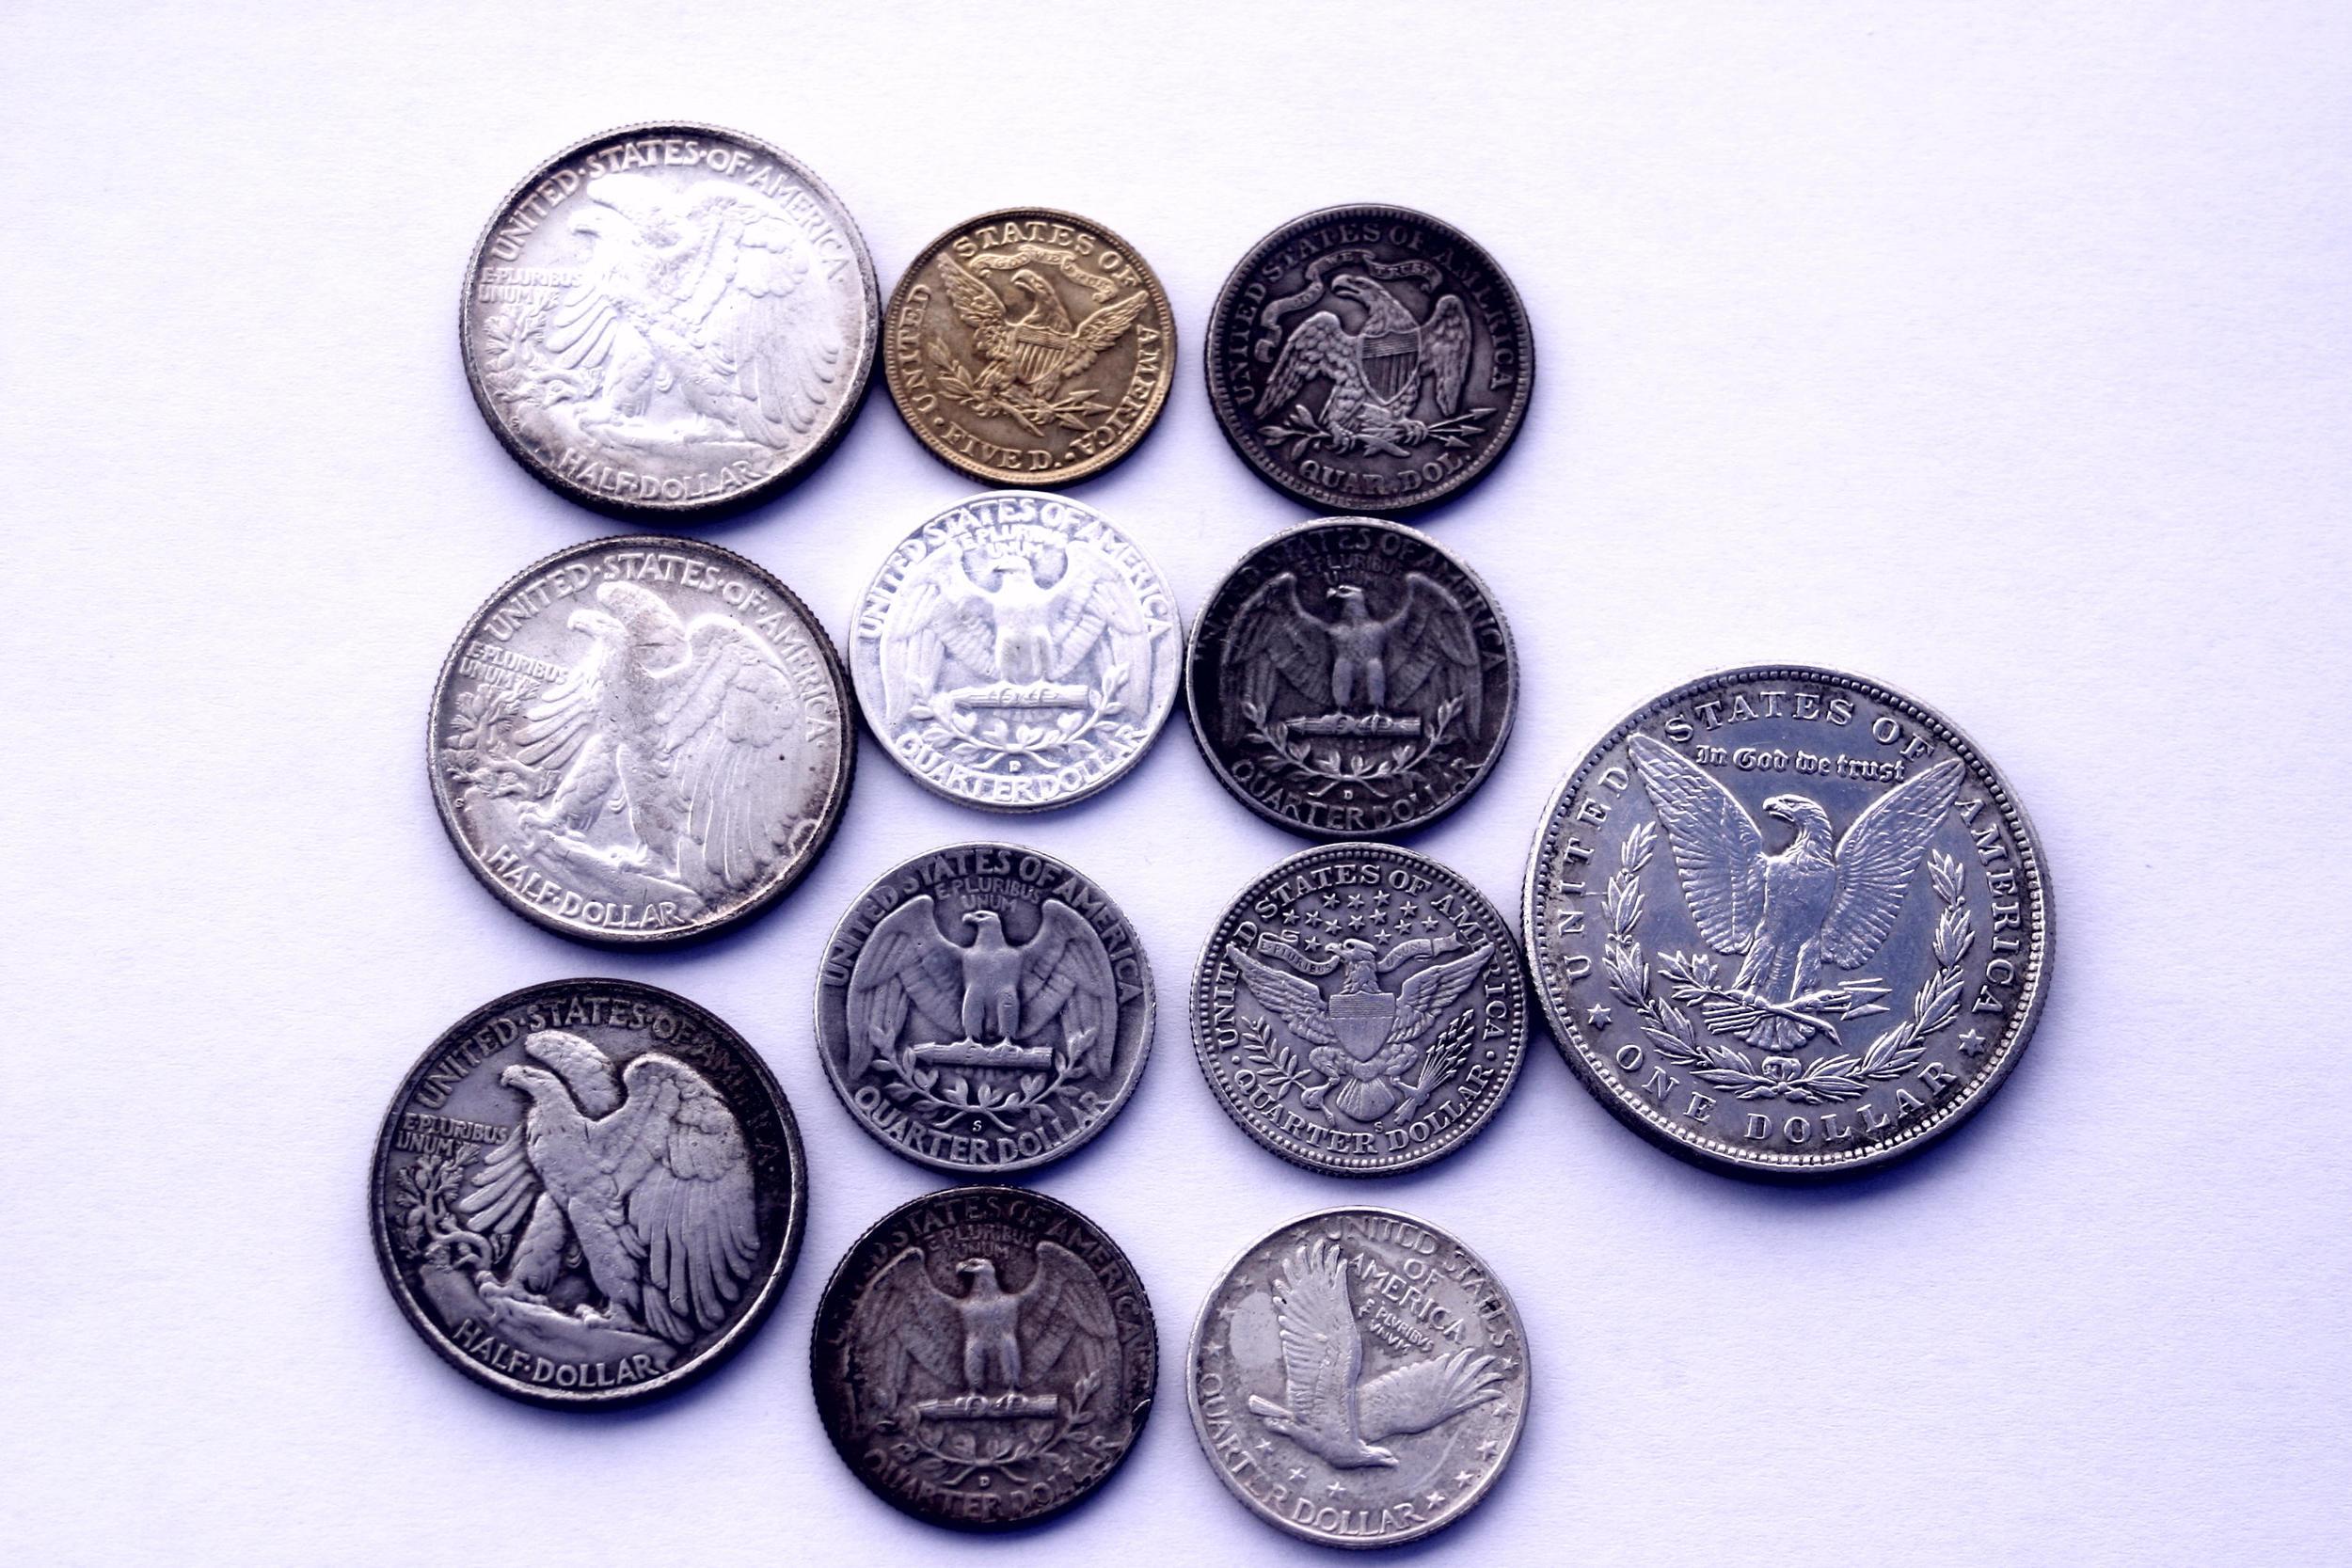 counterfeit silver coins.jpg